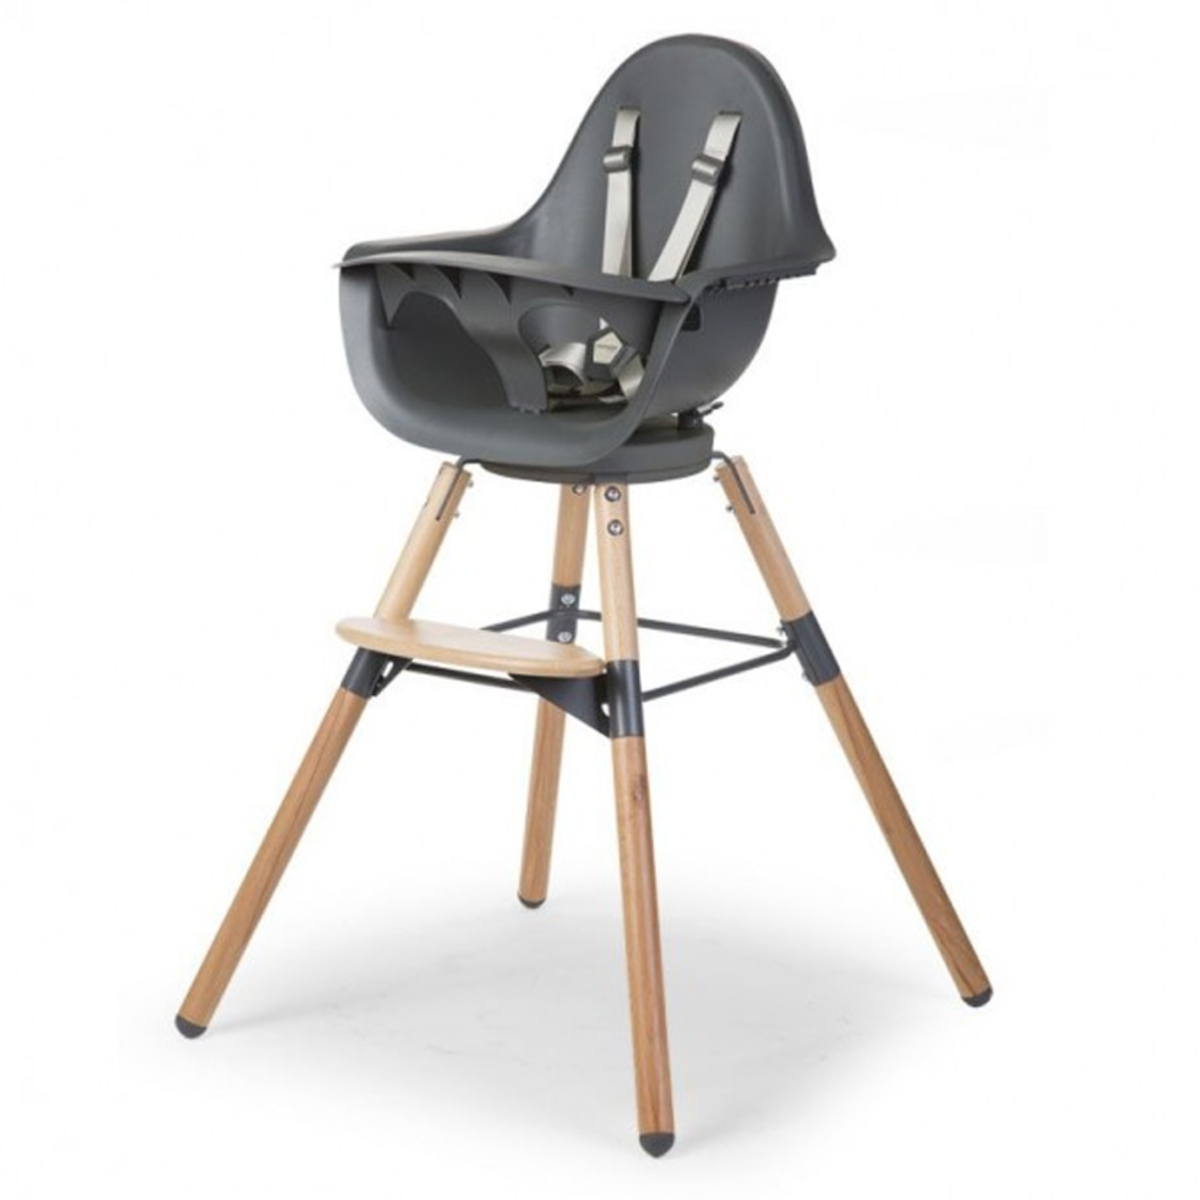 Chaise haute Chaise Haute Evolu One.80° Pieds Bois - Anthracite Chaise Haute Evolu One.80° Pieds Bois - Anthracite